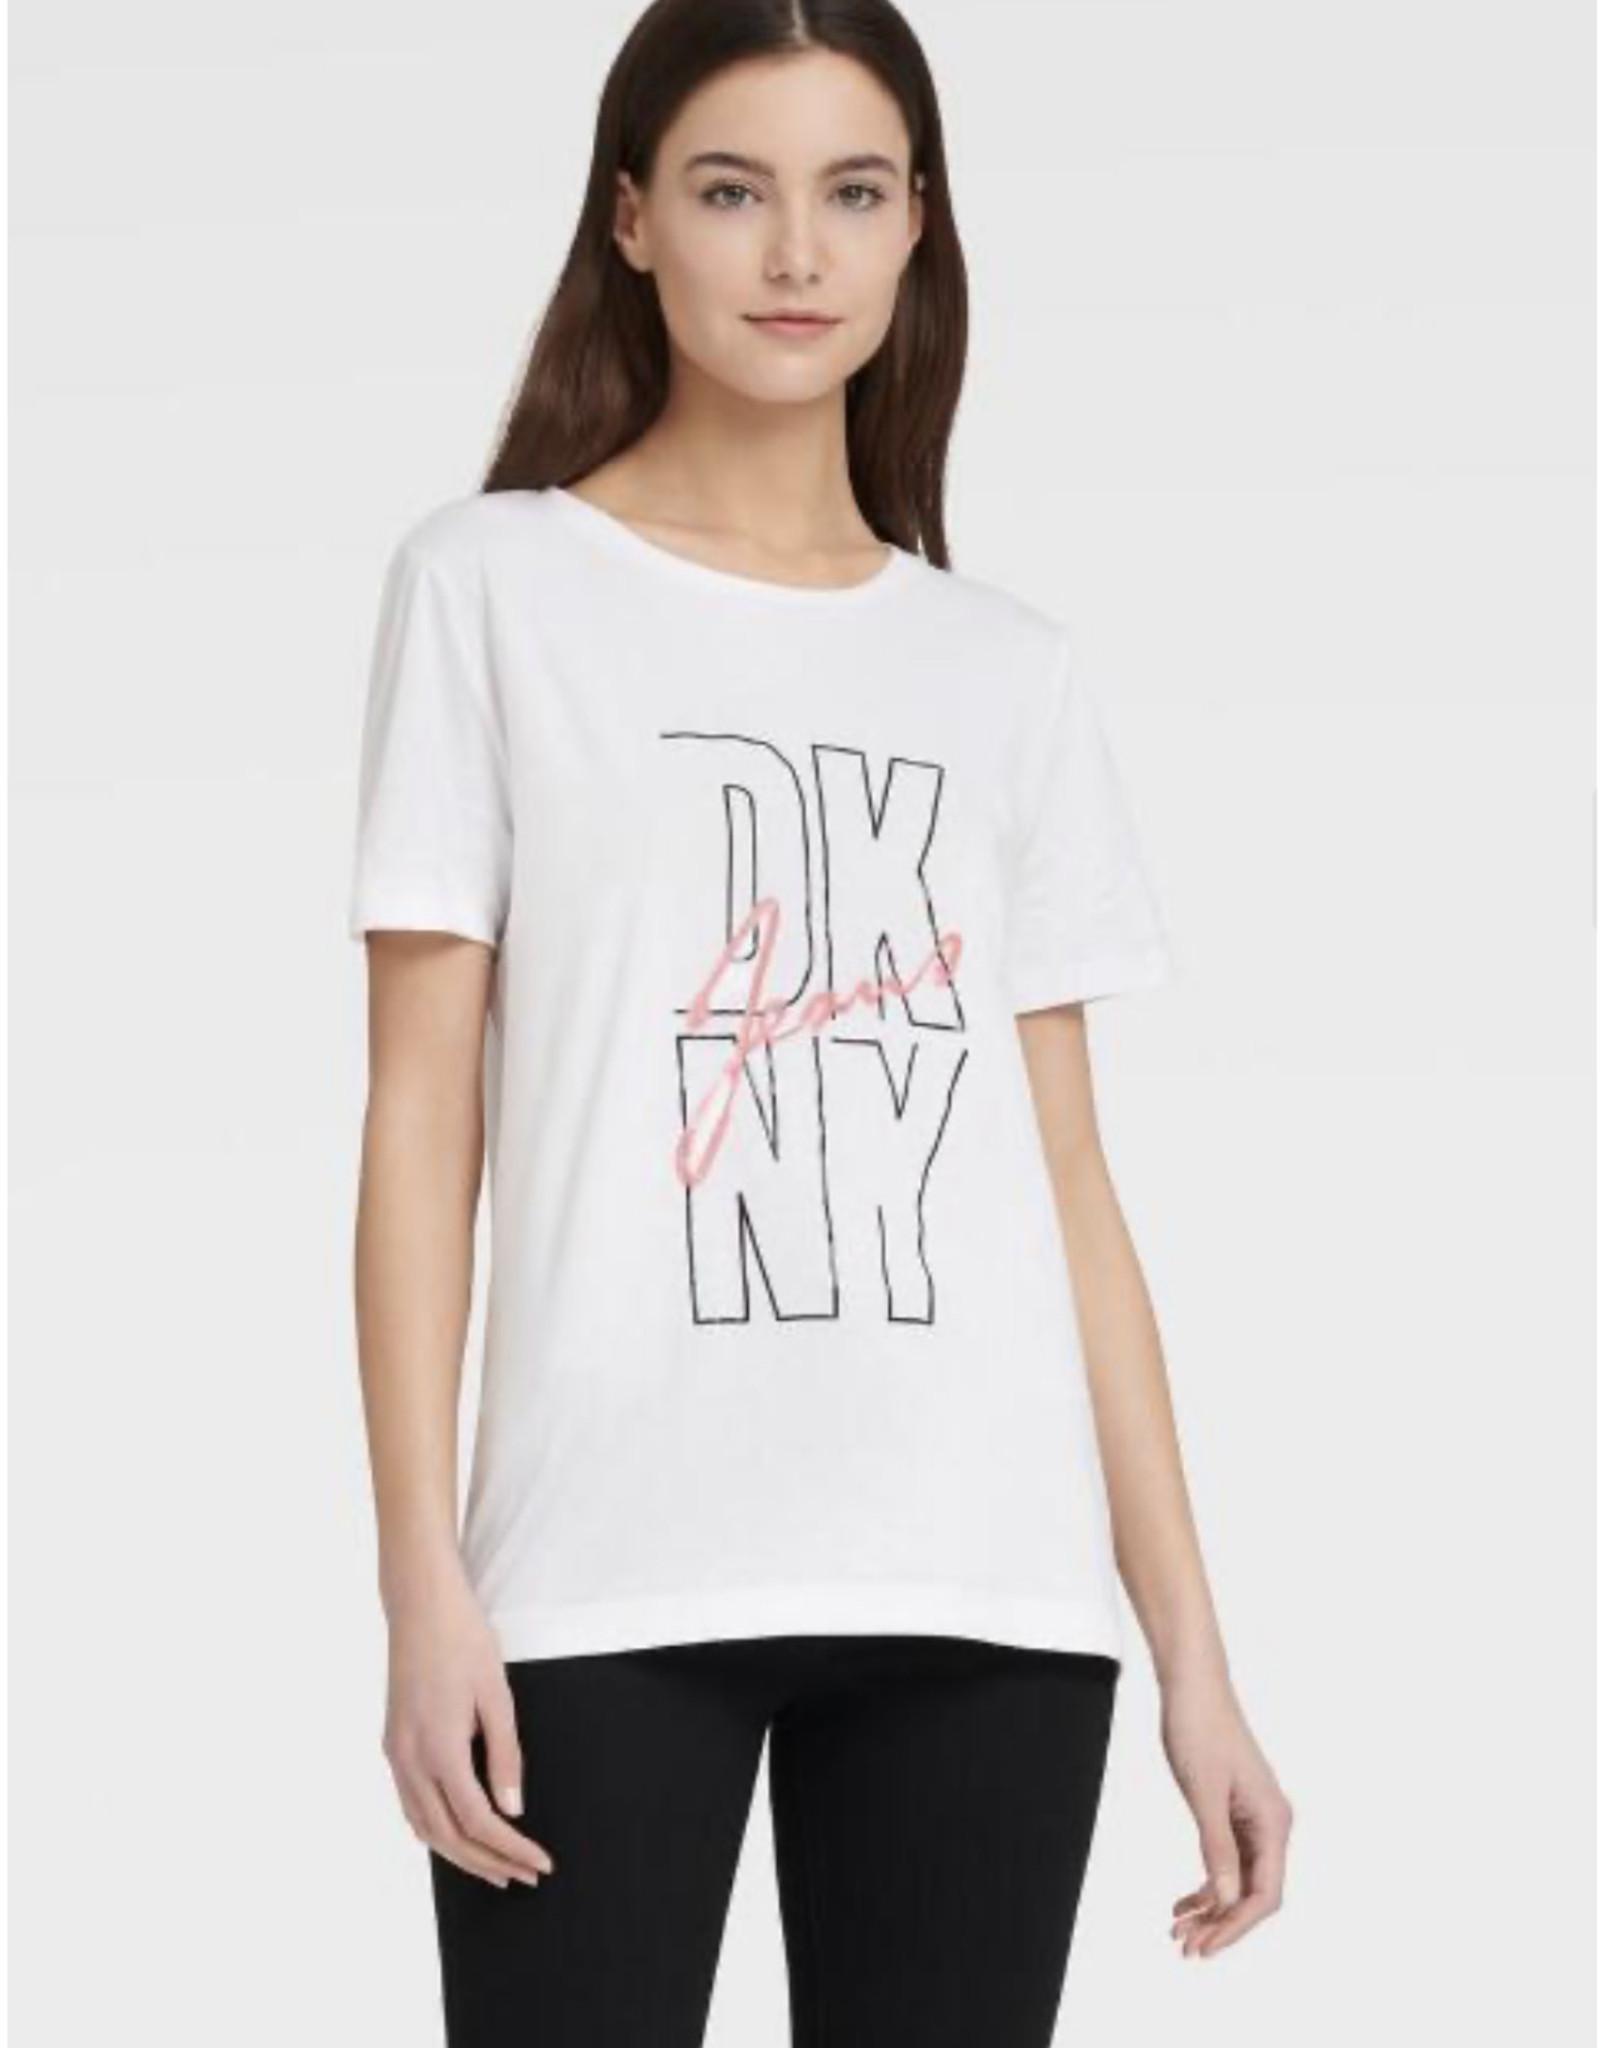 DKNY DKNY Tees with Sequined Logo